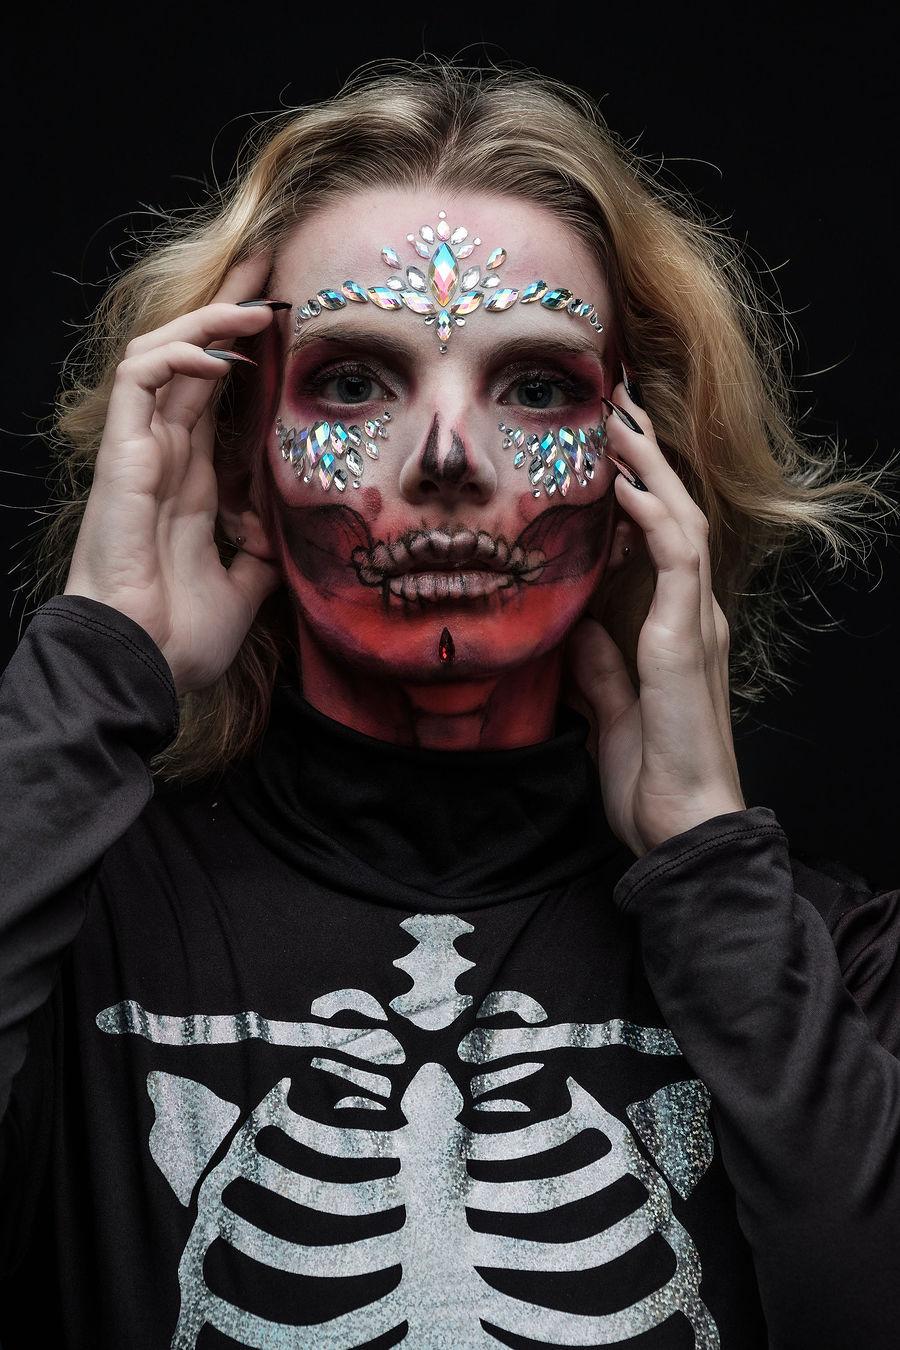 Those powerful eyes! / Photography by Iain Blacklock, Model LeahMeraki, Stylist LeahMeraki, Taken at Rochester Studios / Uploaded 1st November 2020 @ 09:22 AM